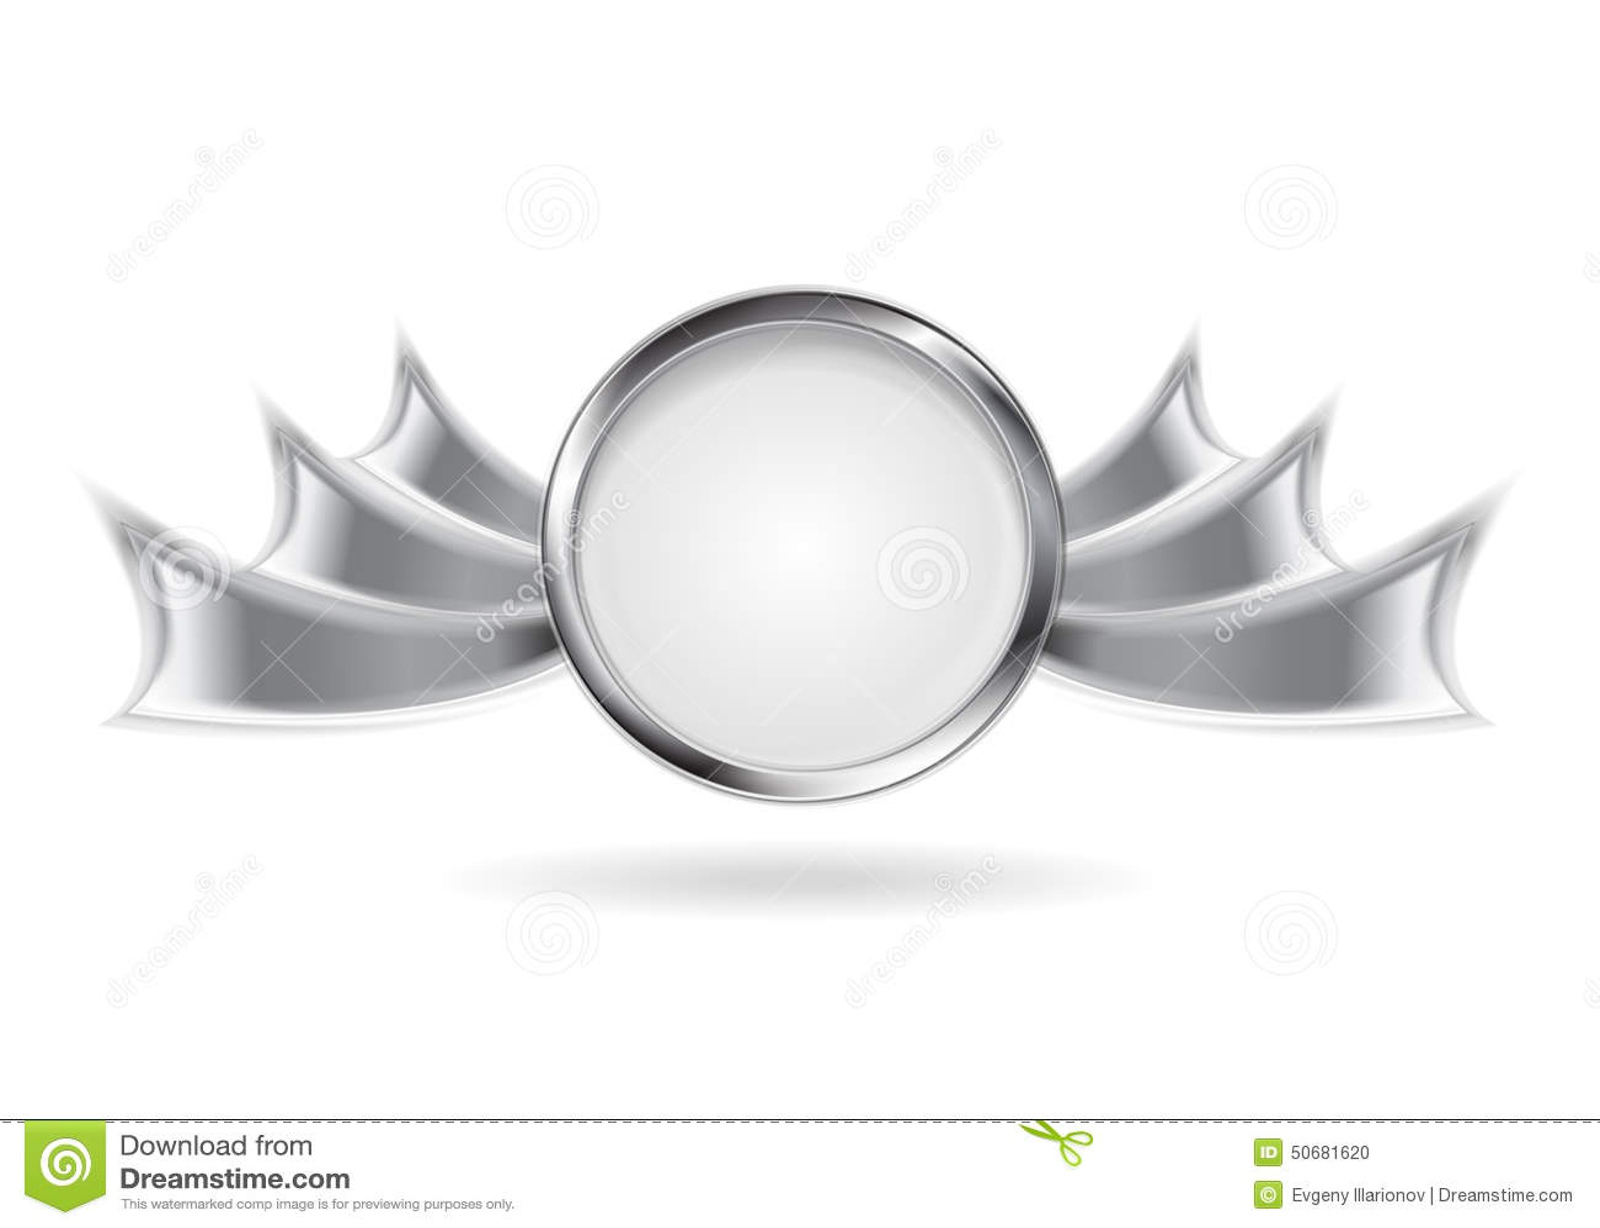 emblem background silver - photo #38